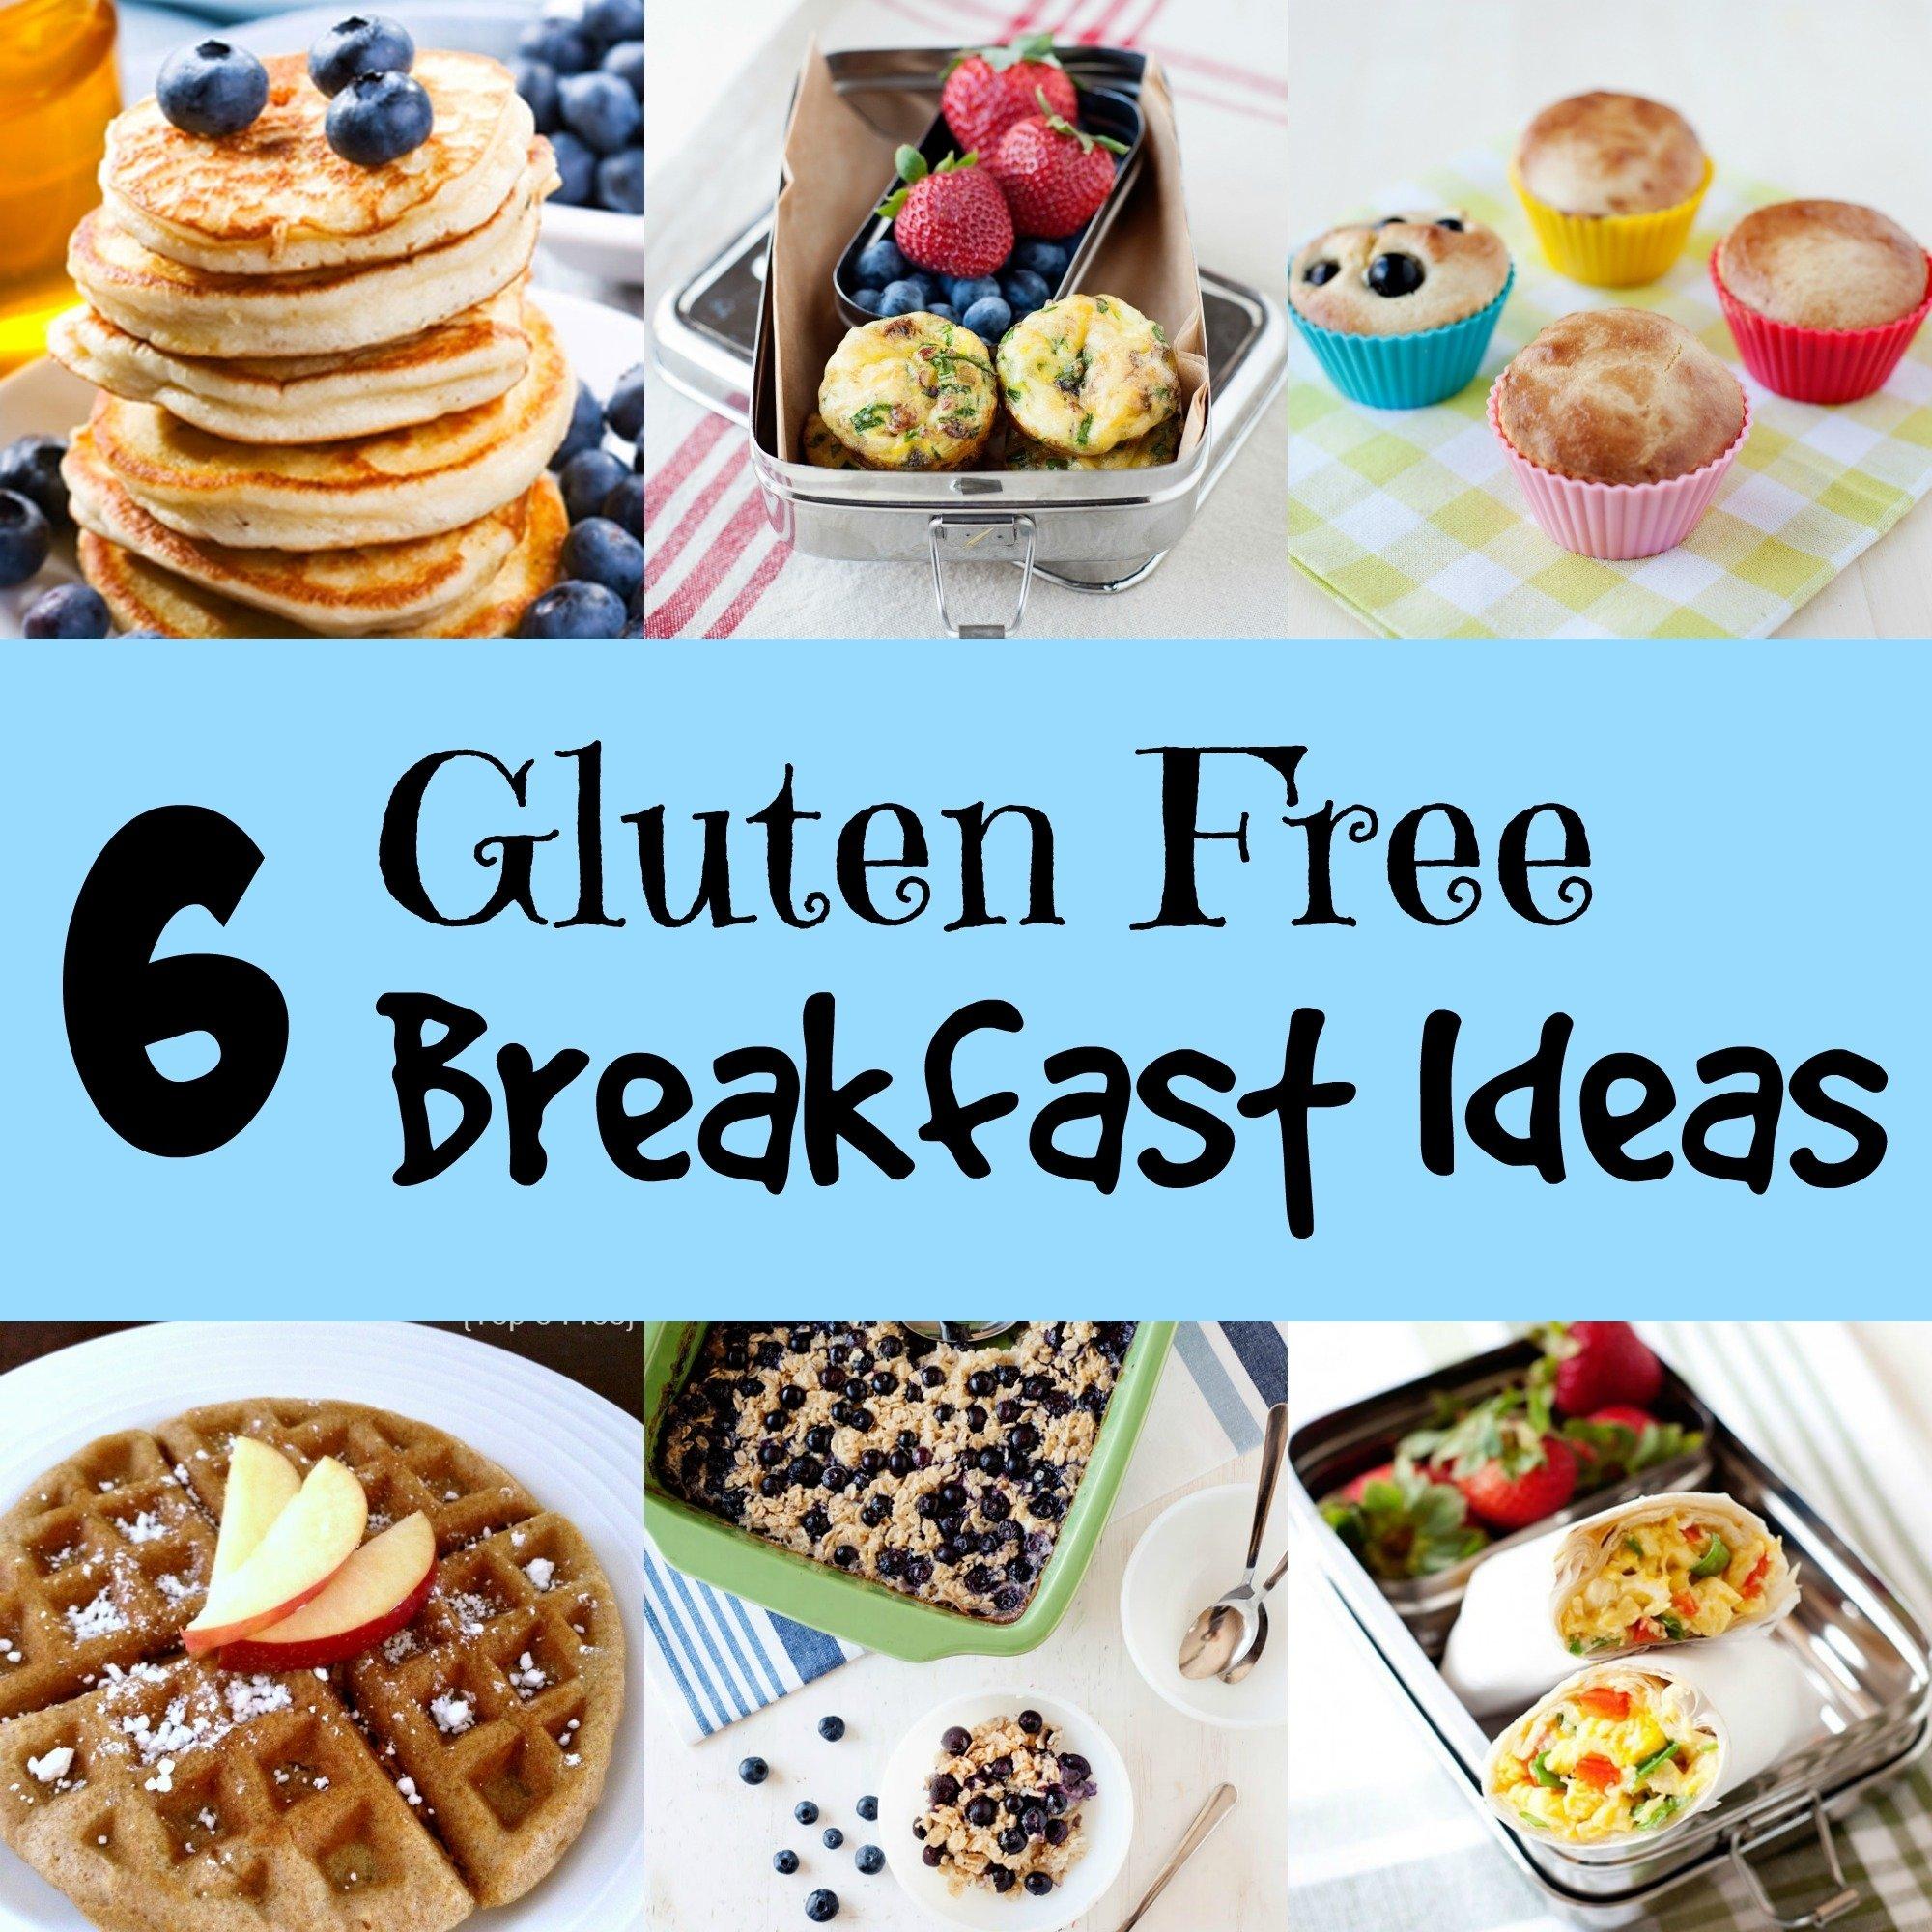 10 Spectacular Gluten Free Breakfast Ideas Quick 6 gluten free breakfast ideas momables 8 2021